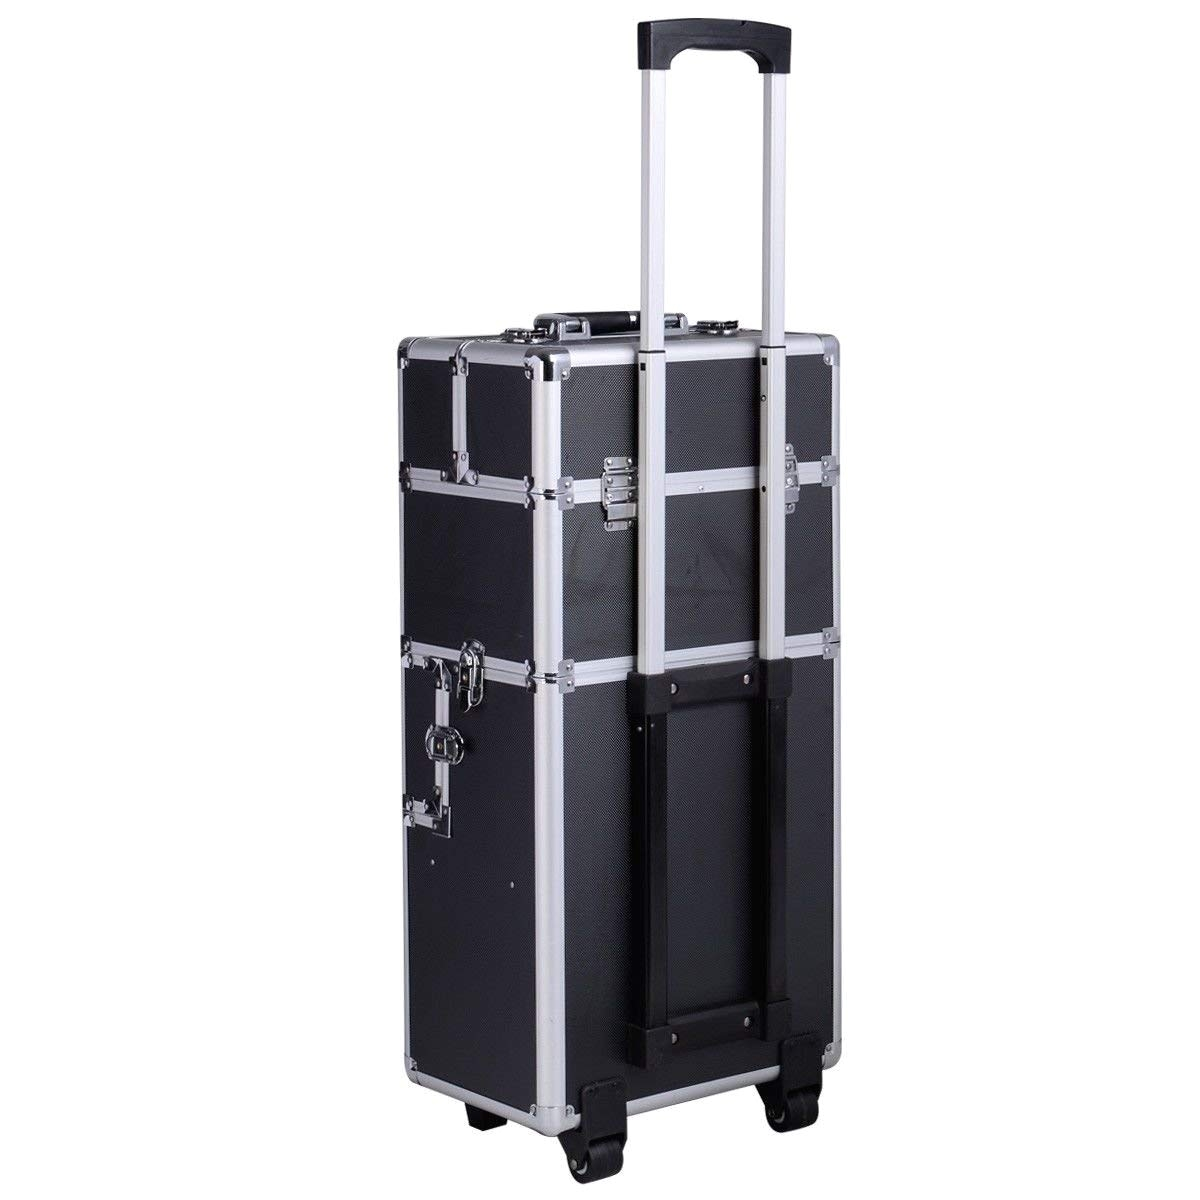 amazon com comie 3 in 1 pro aluminum rolling makeup case salon cosmetic box organizer trolley train case wheeled artist travel beauty